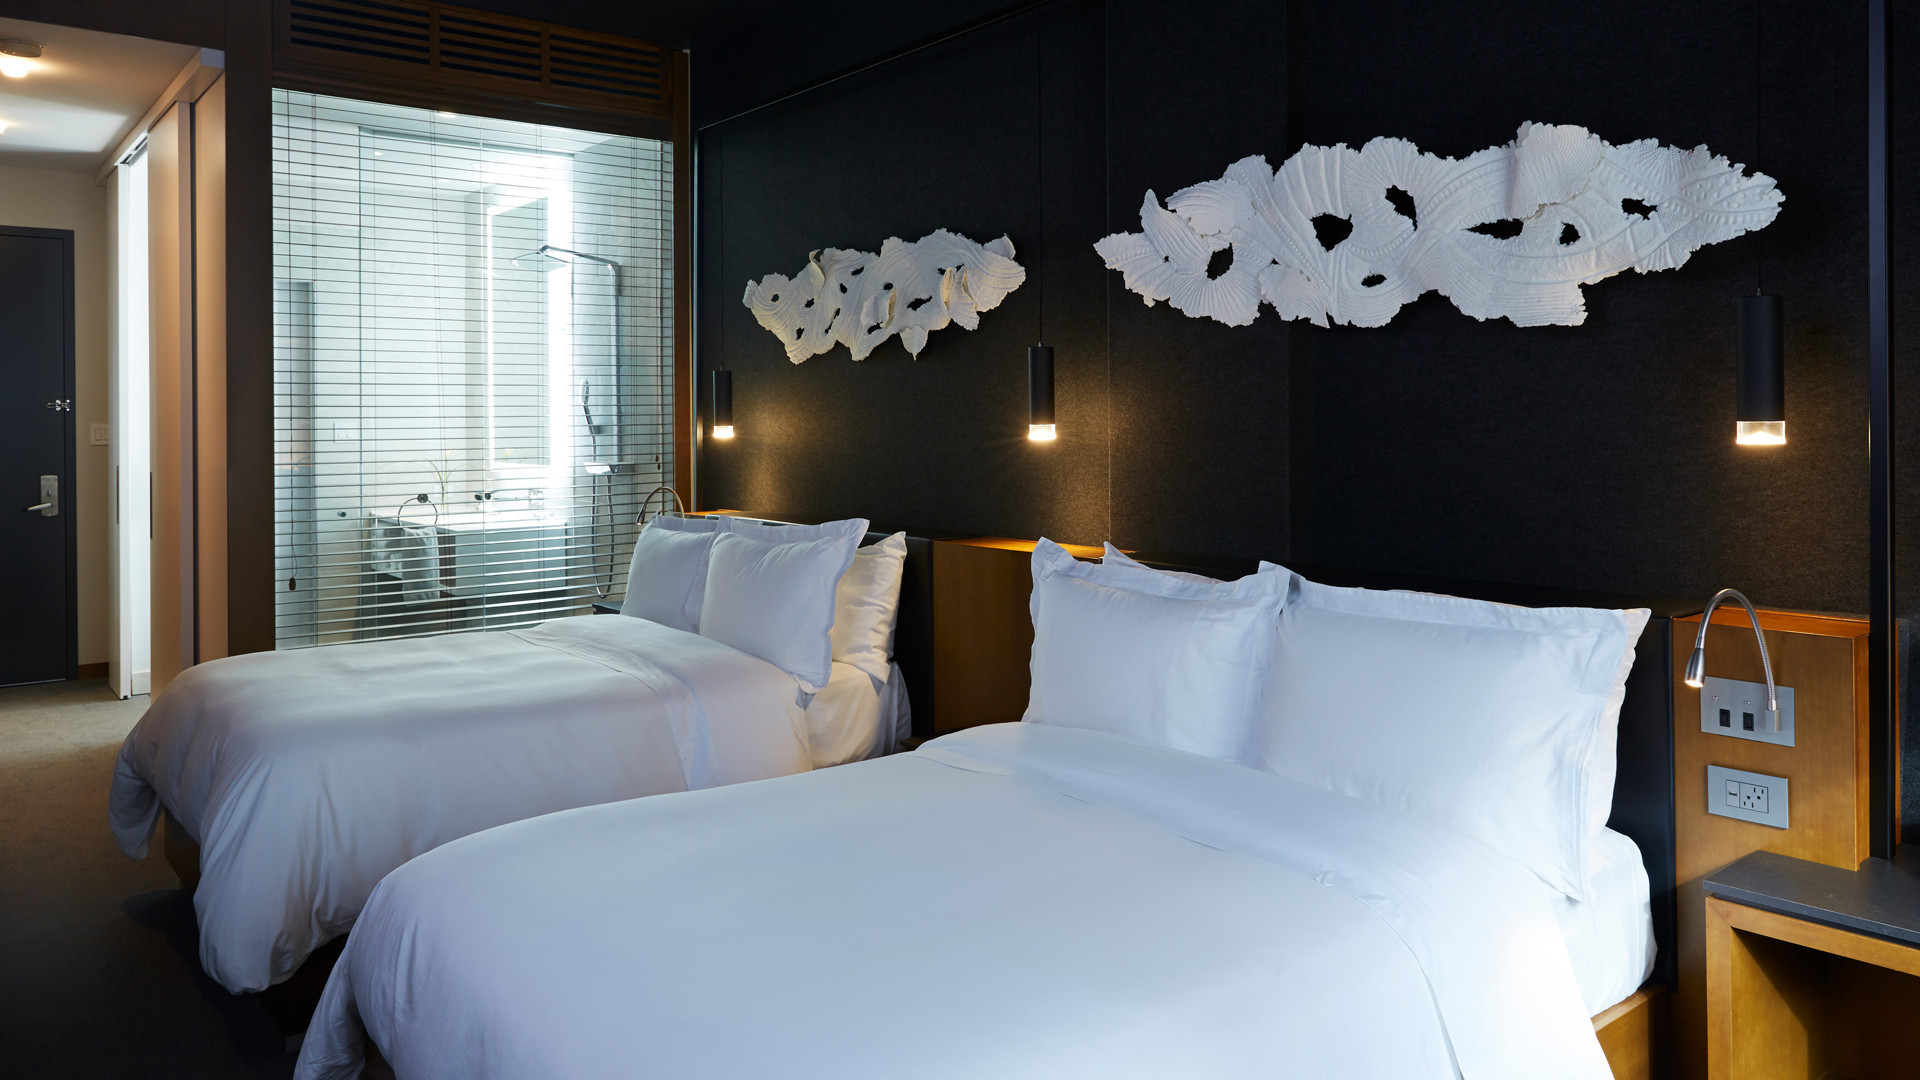 Best hotels Toronto staycation | Le Germain Hotel Toronto Mercer two bedroom suite